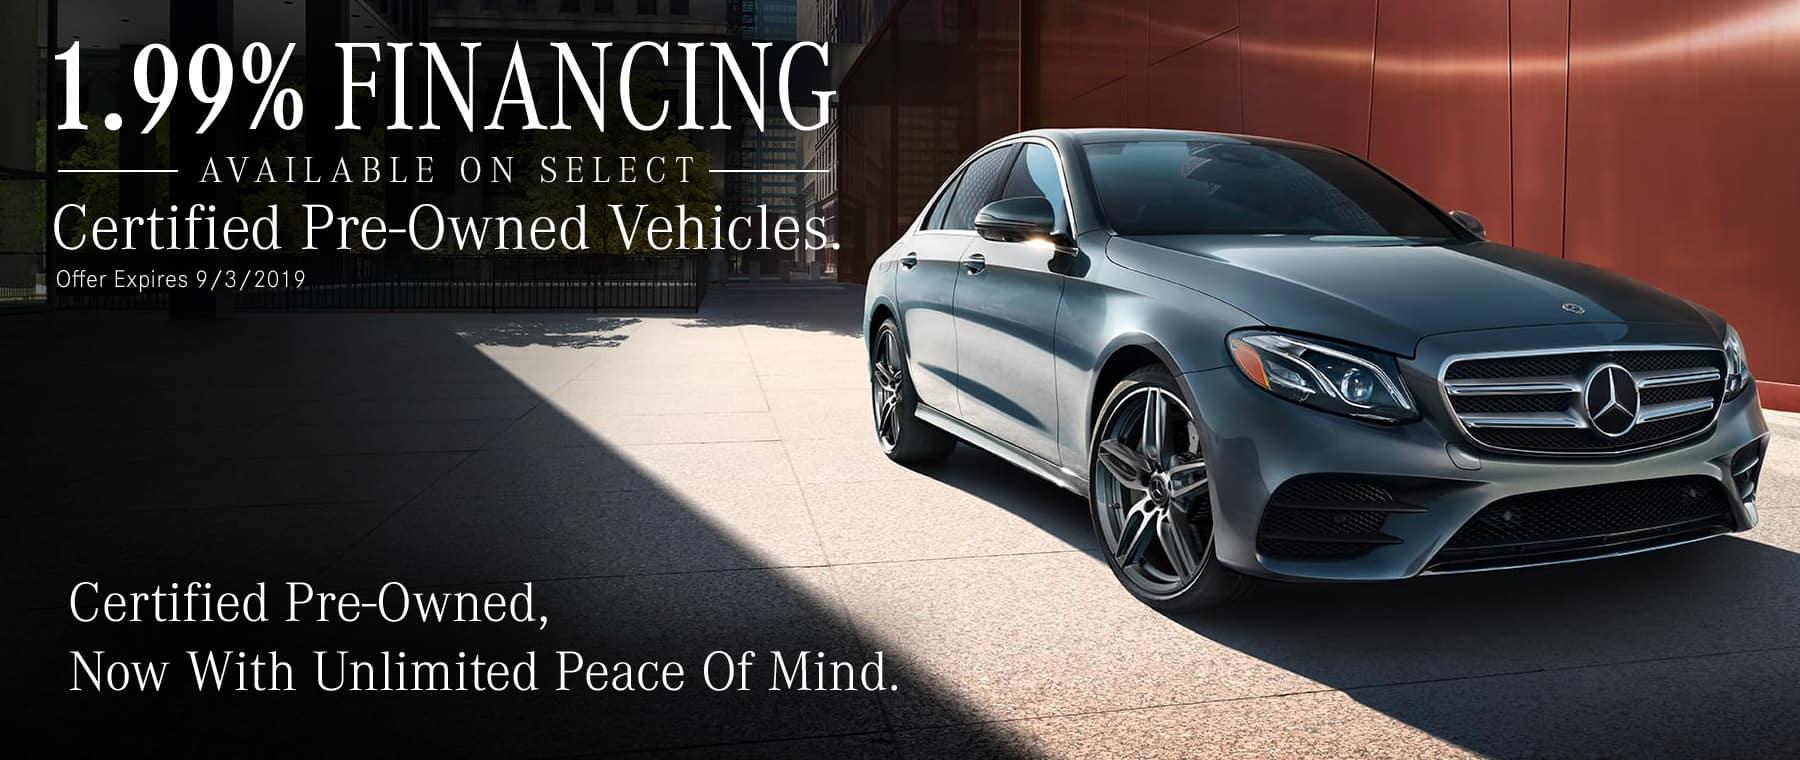 Mercedes Benz Of North Haven Home Facebook >> Mercedes Benz Of Huntington Mercedes Benz Dealer In Huntington Ny